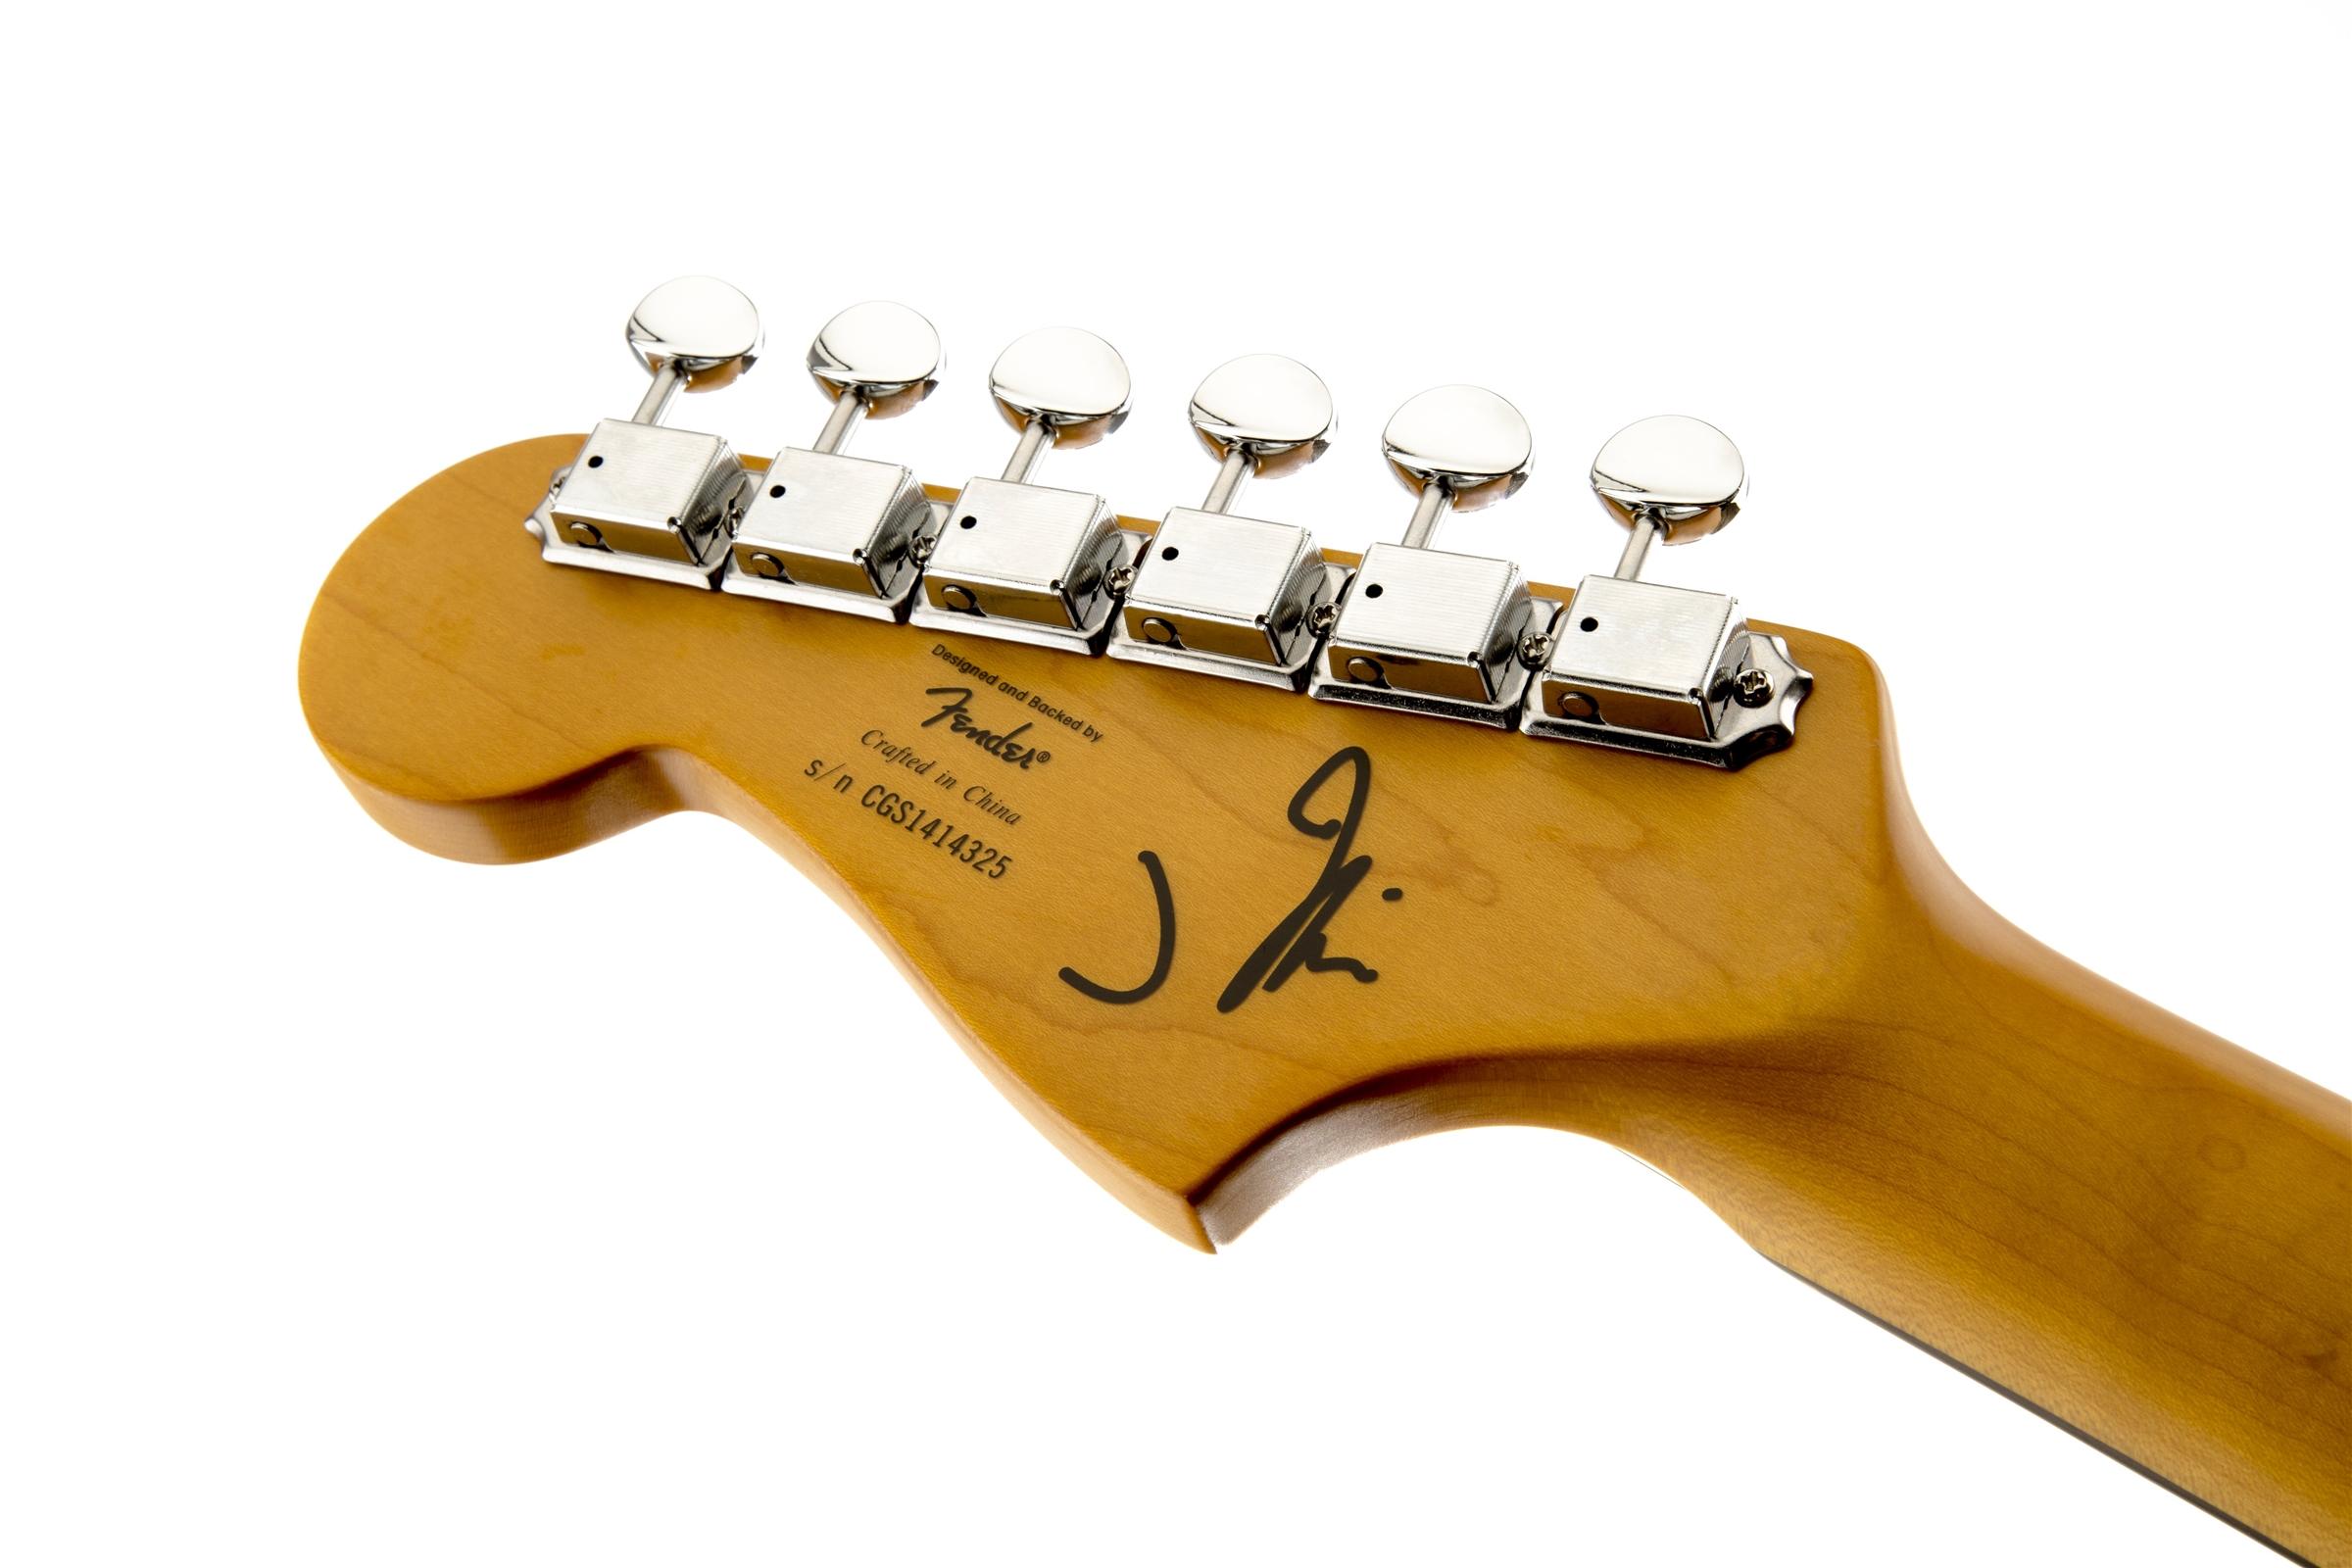 squier� j mascis jazzmaster� squier electric guitars squier j mascis jazzmaster wiring Fender Guitar Diagram mascis jazzmaster wiring diagram